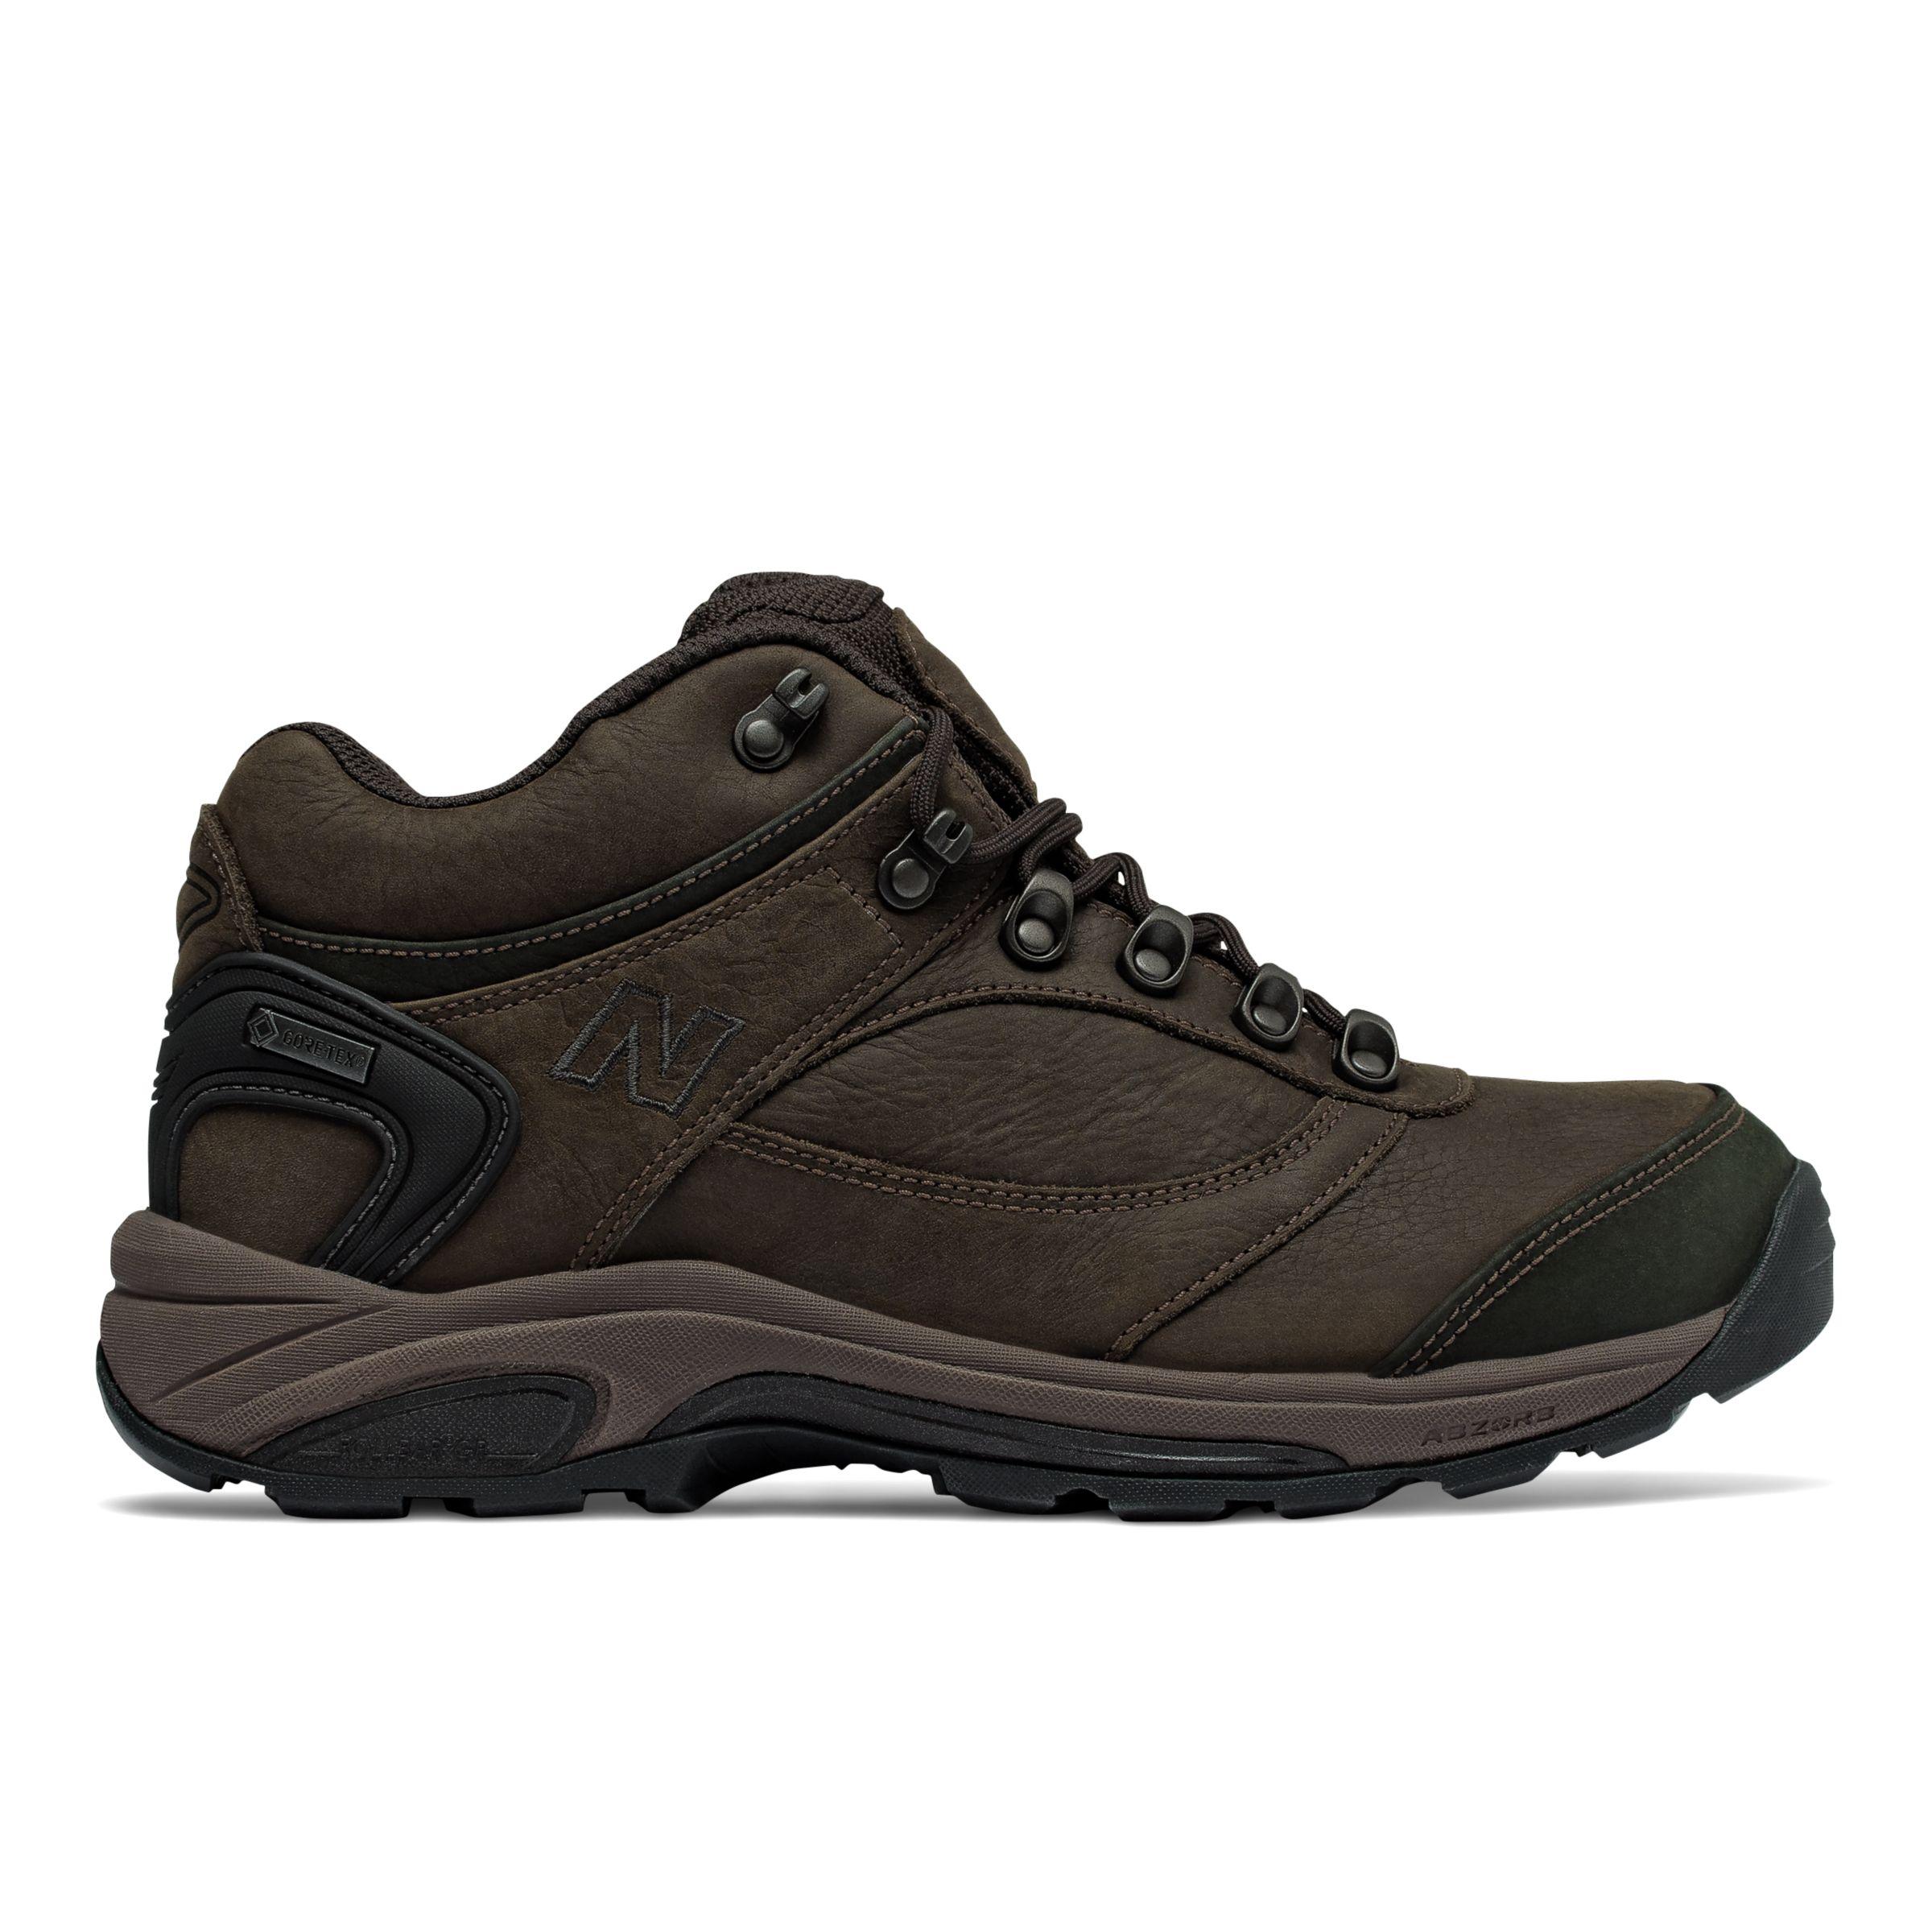 new balance hiking sneakers